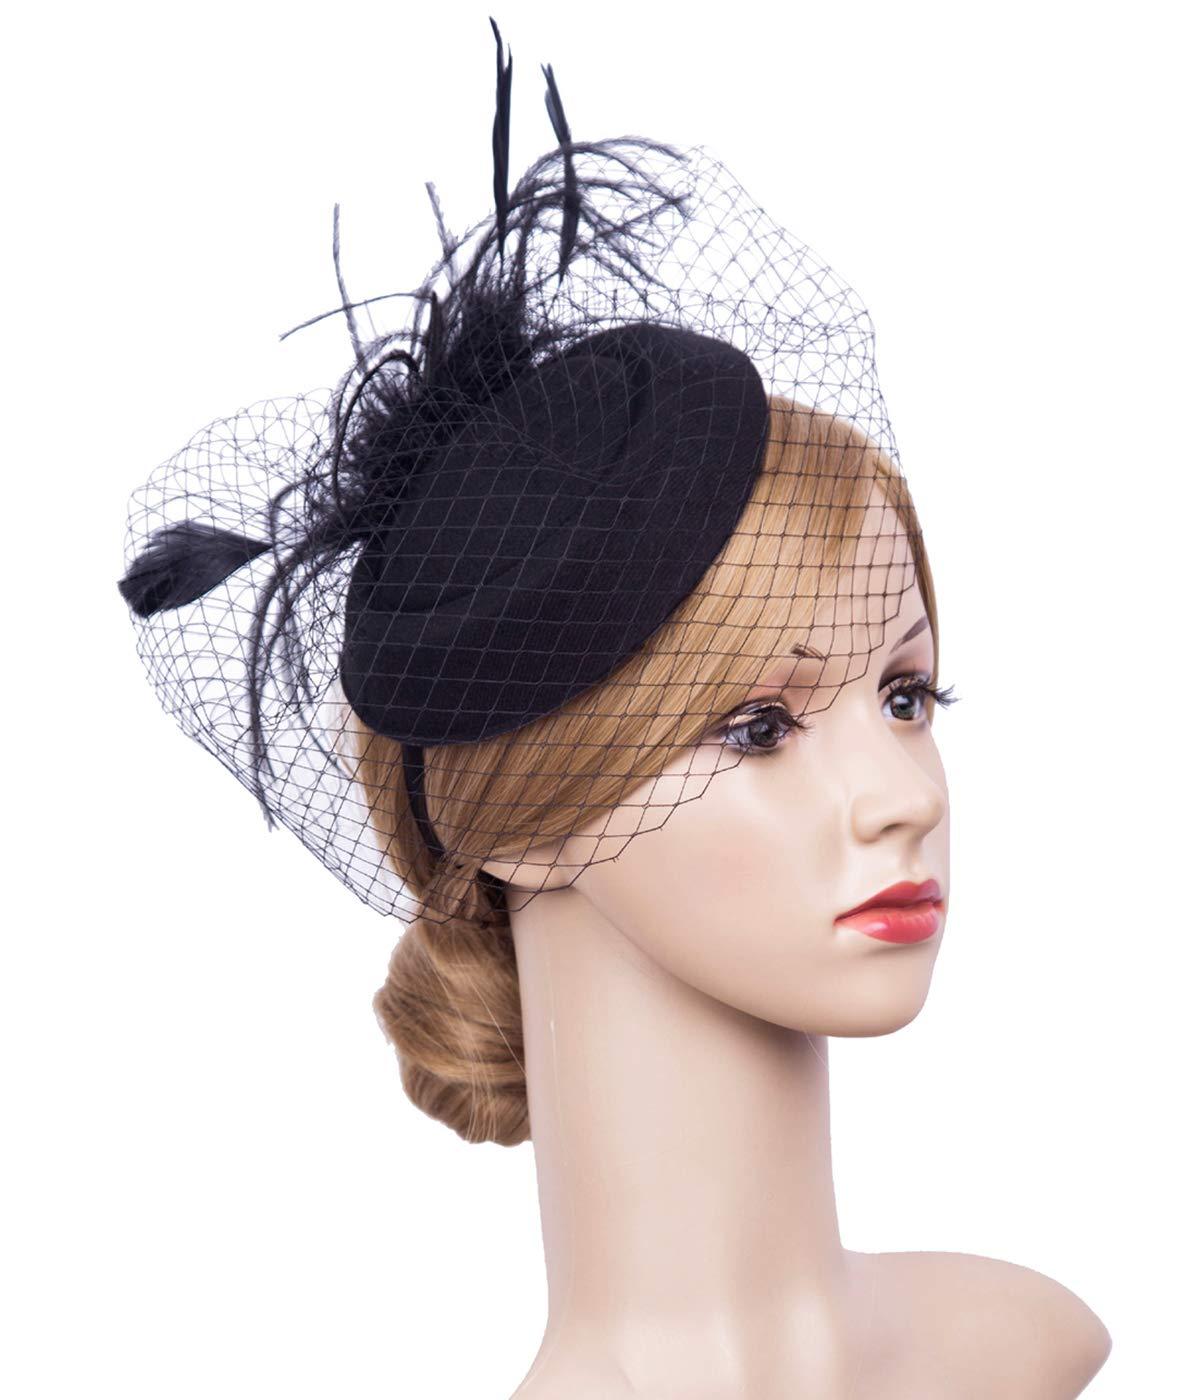 K.CLASSIC Fascinator Hair Clip Pillbox Hat Bowler Feather Flower Veil Wedding Party Hat (Black5)